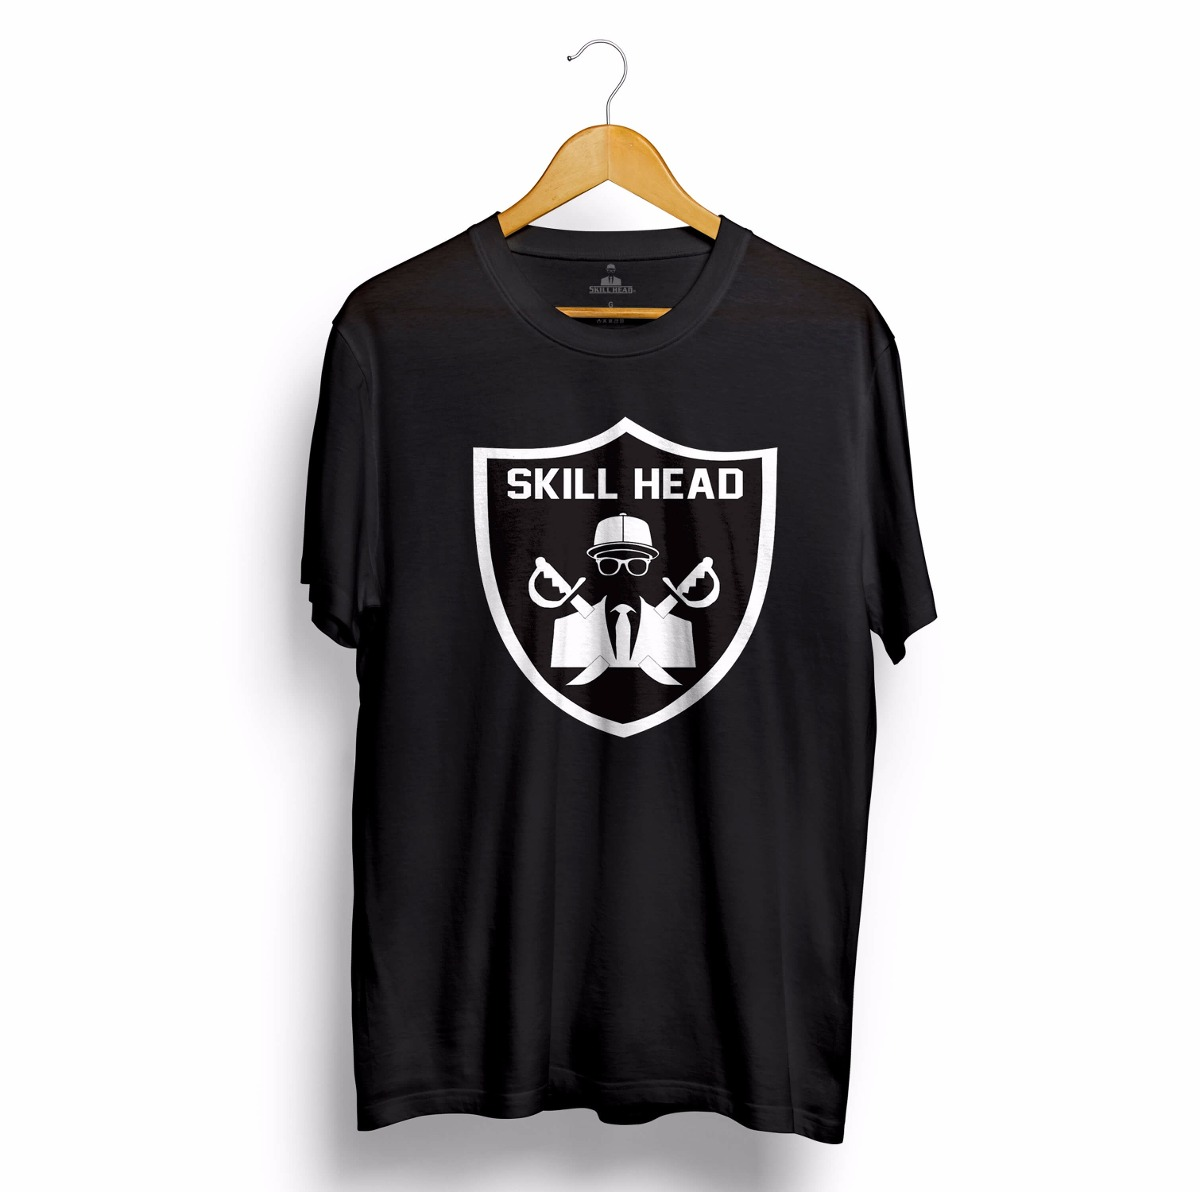 a6c3b6f49 camiseta tipo oakland raiders nfl futebol americano preta. Carregando zoom.